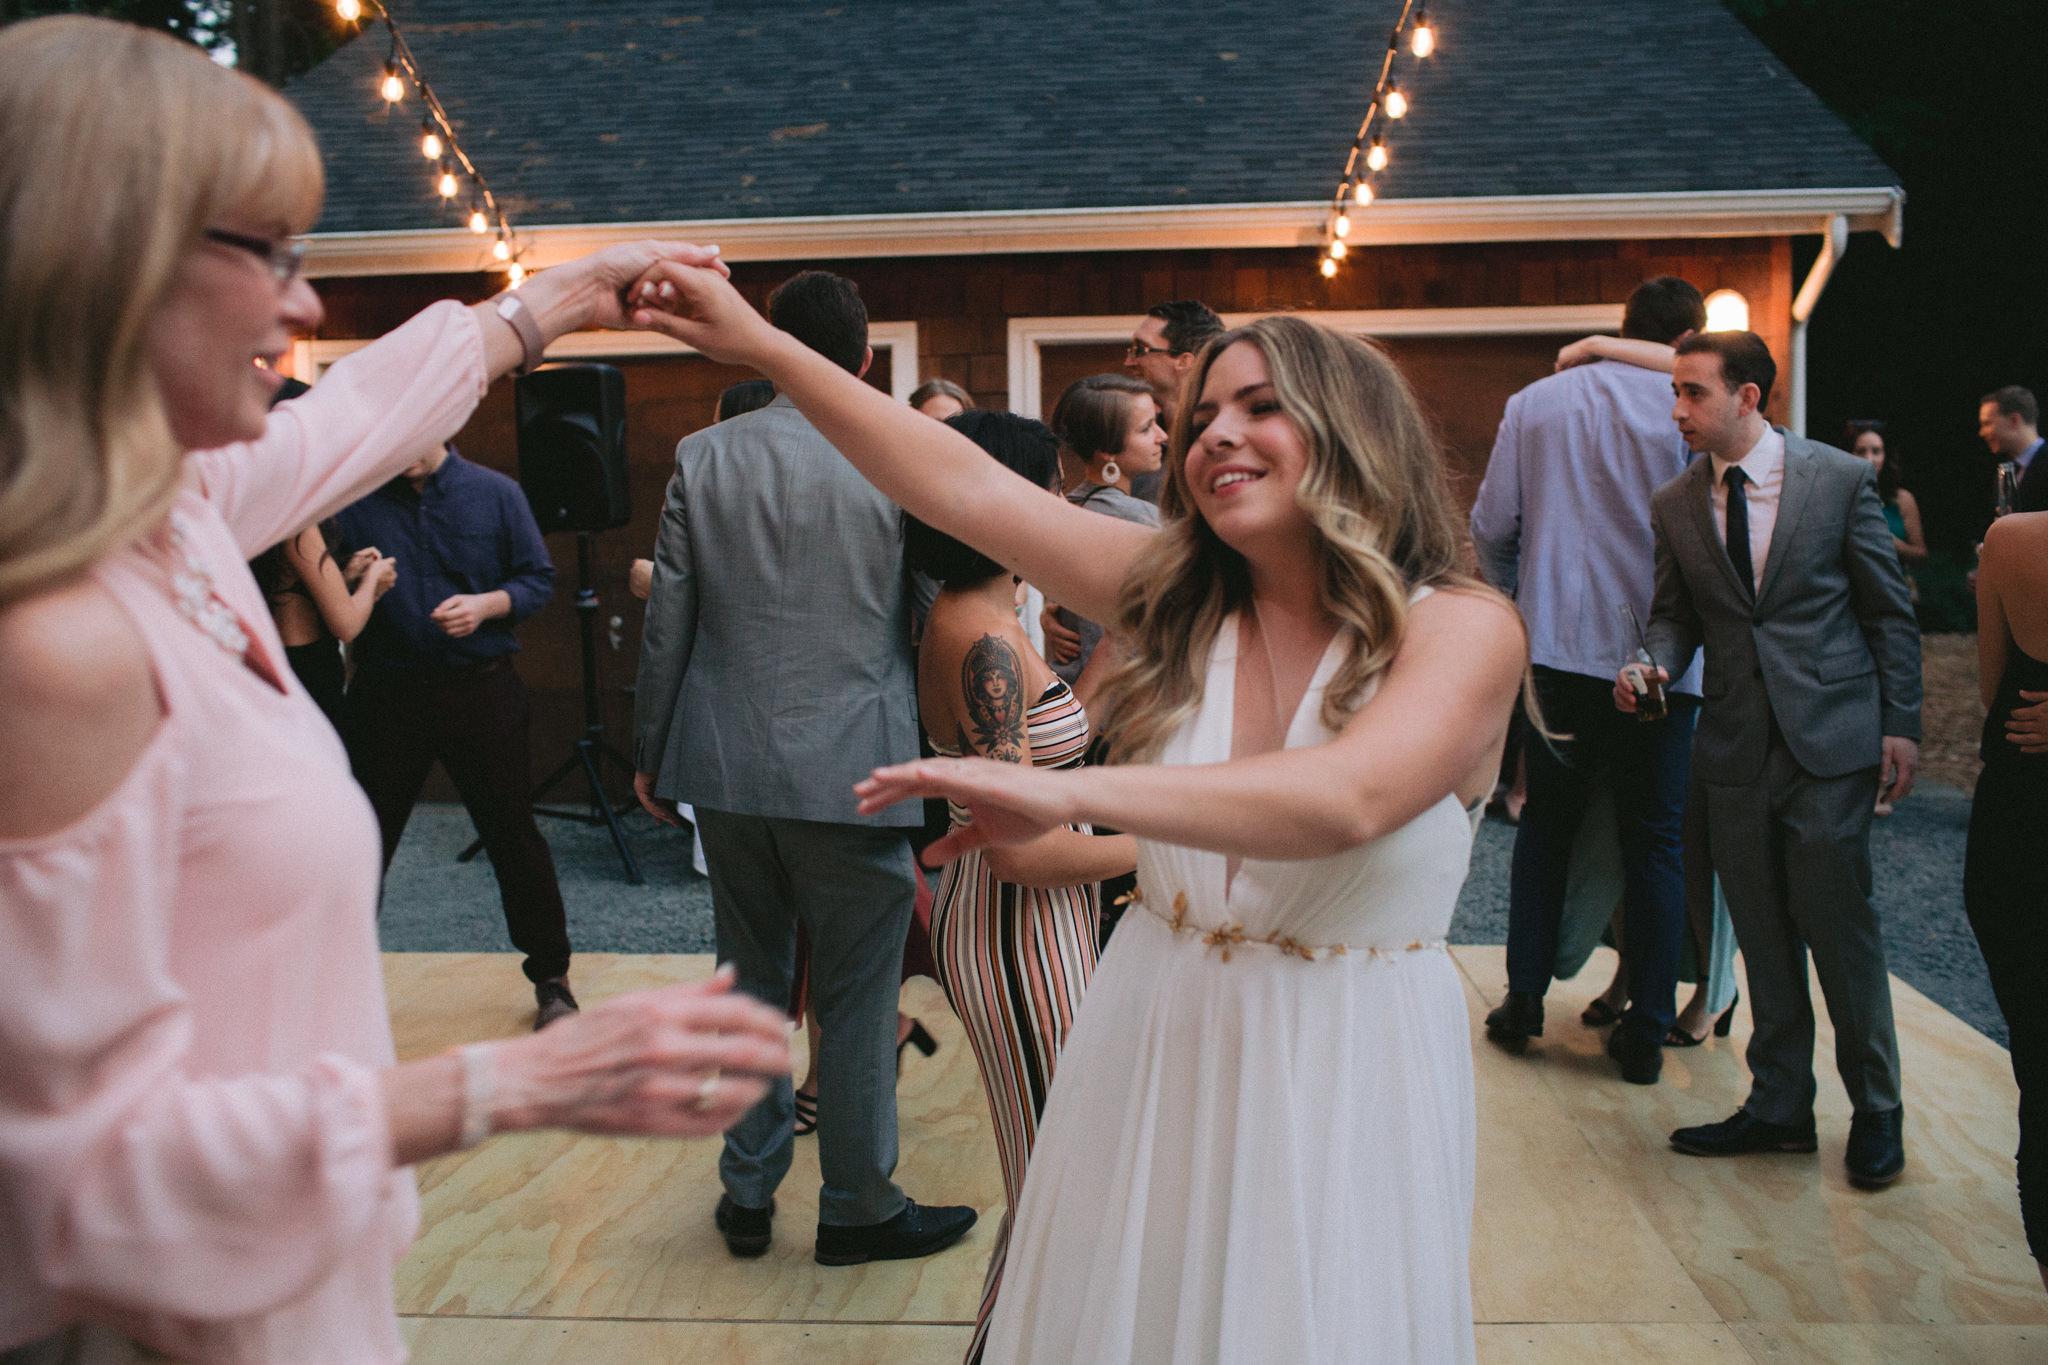 Backyard-Bainbridge-Island-Wedding-Alycia-Lovell-Photography-235.JPG